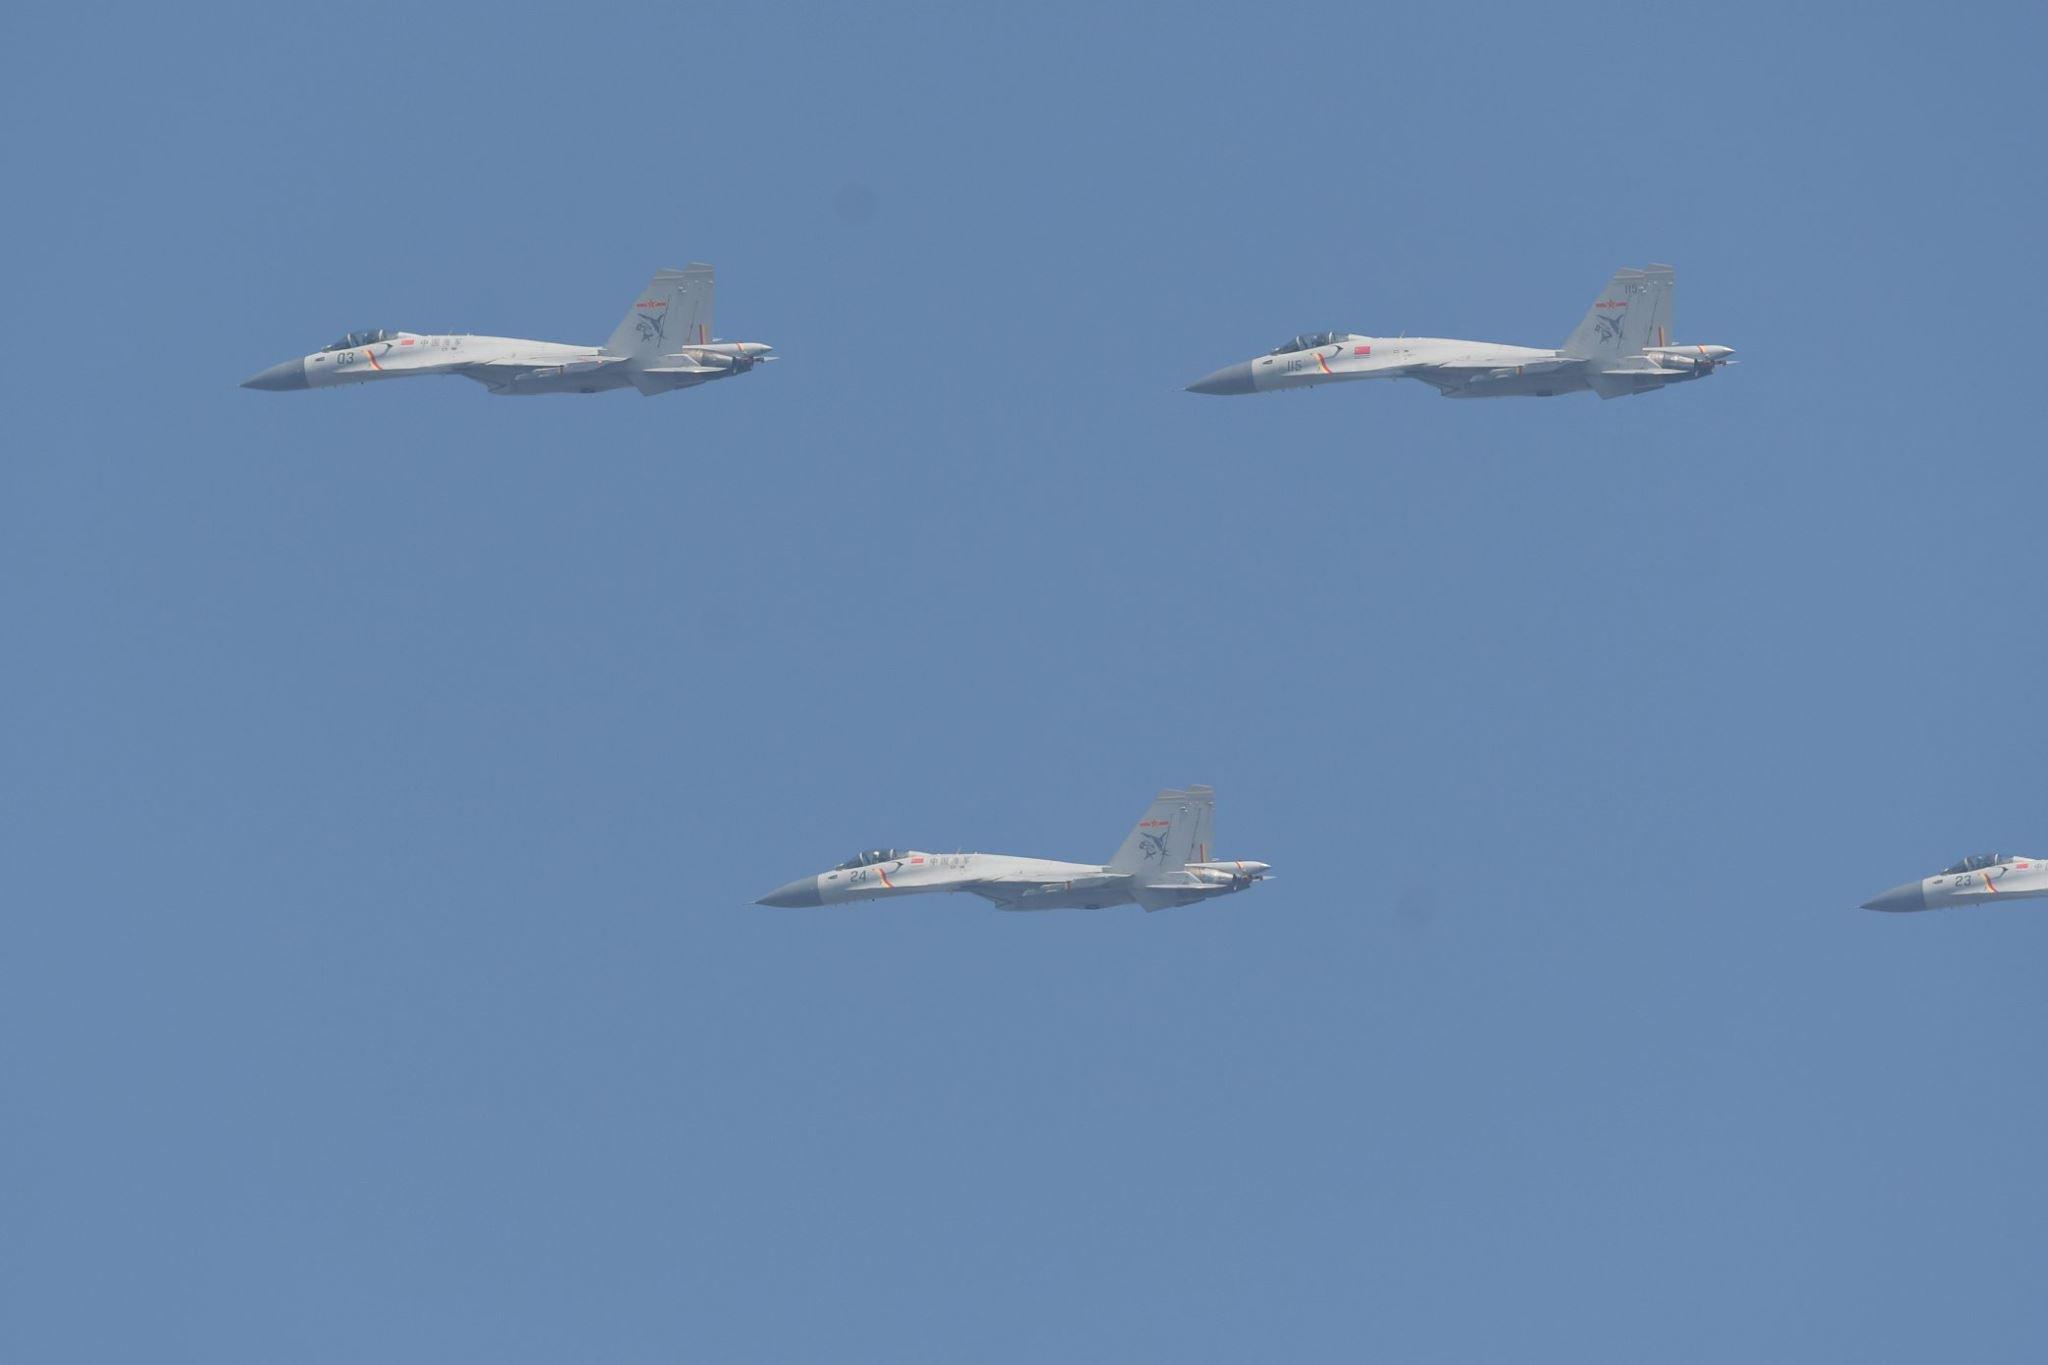 BDB97E07-4D29-46AD-82CA-F65E7E5A5465.jpeg